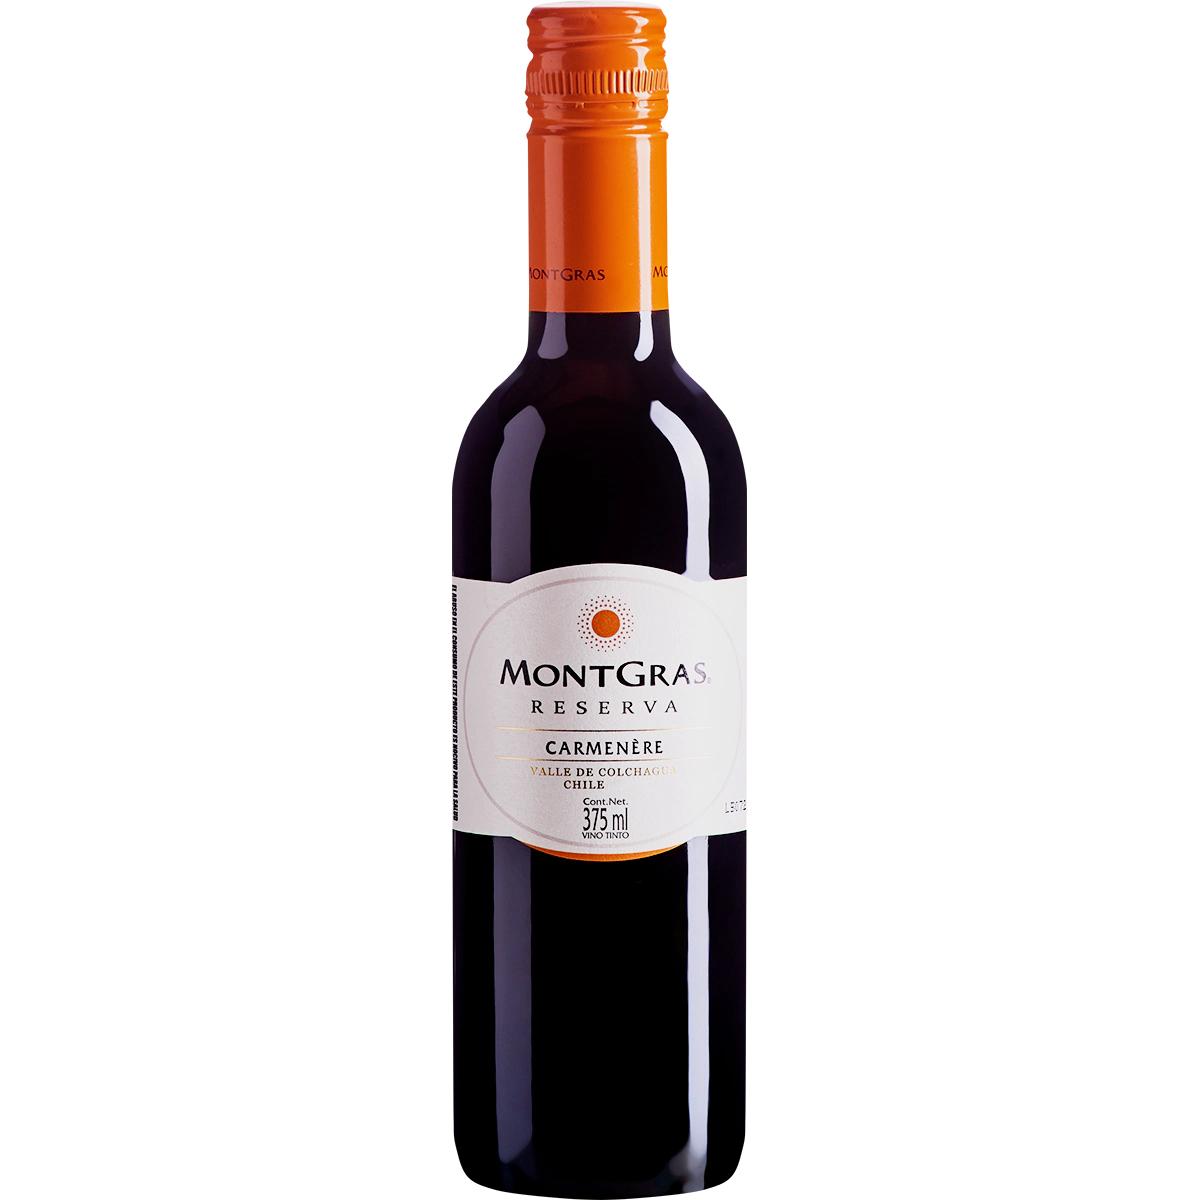 Vinho Tinto Carmenere Reserva Montgras 375mL  - ADEGA FARRET